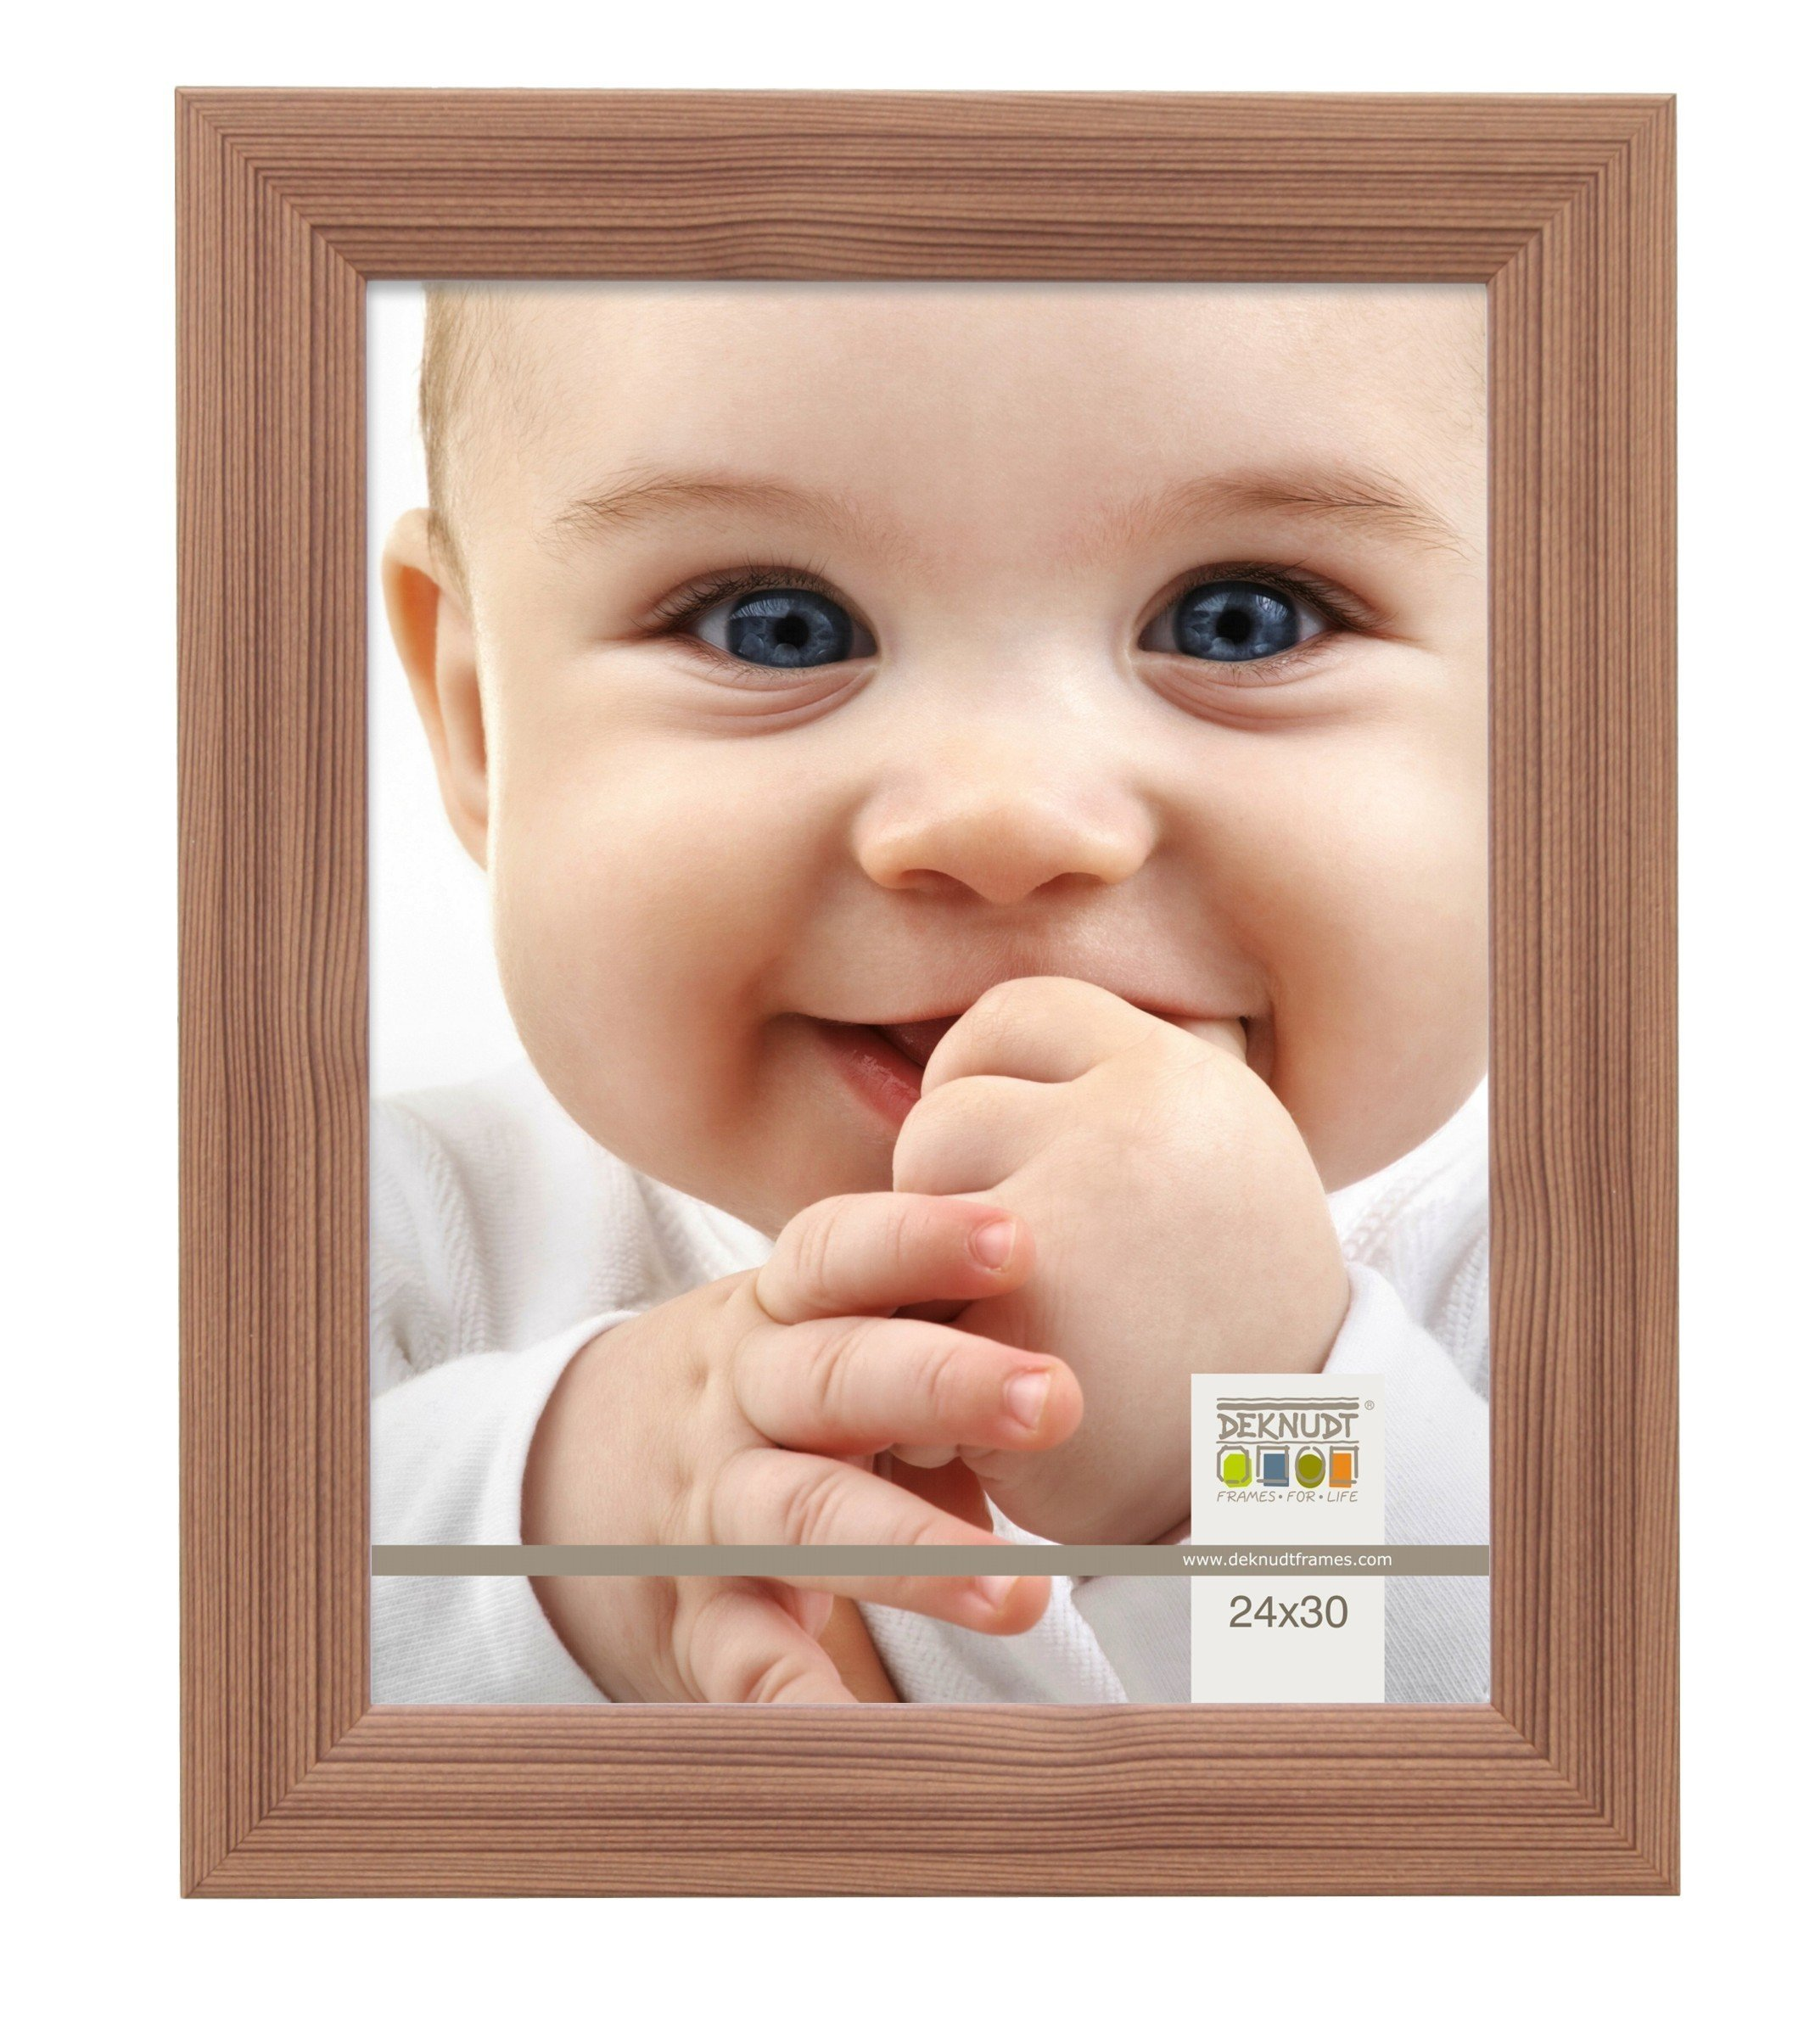 Deknudt Frames S53GH3 50x60 Photoframe Brown Wood